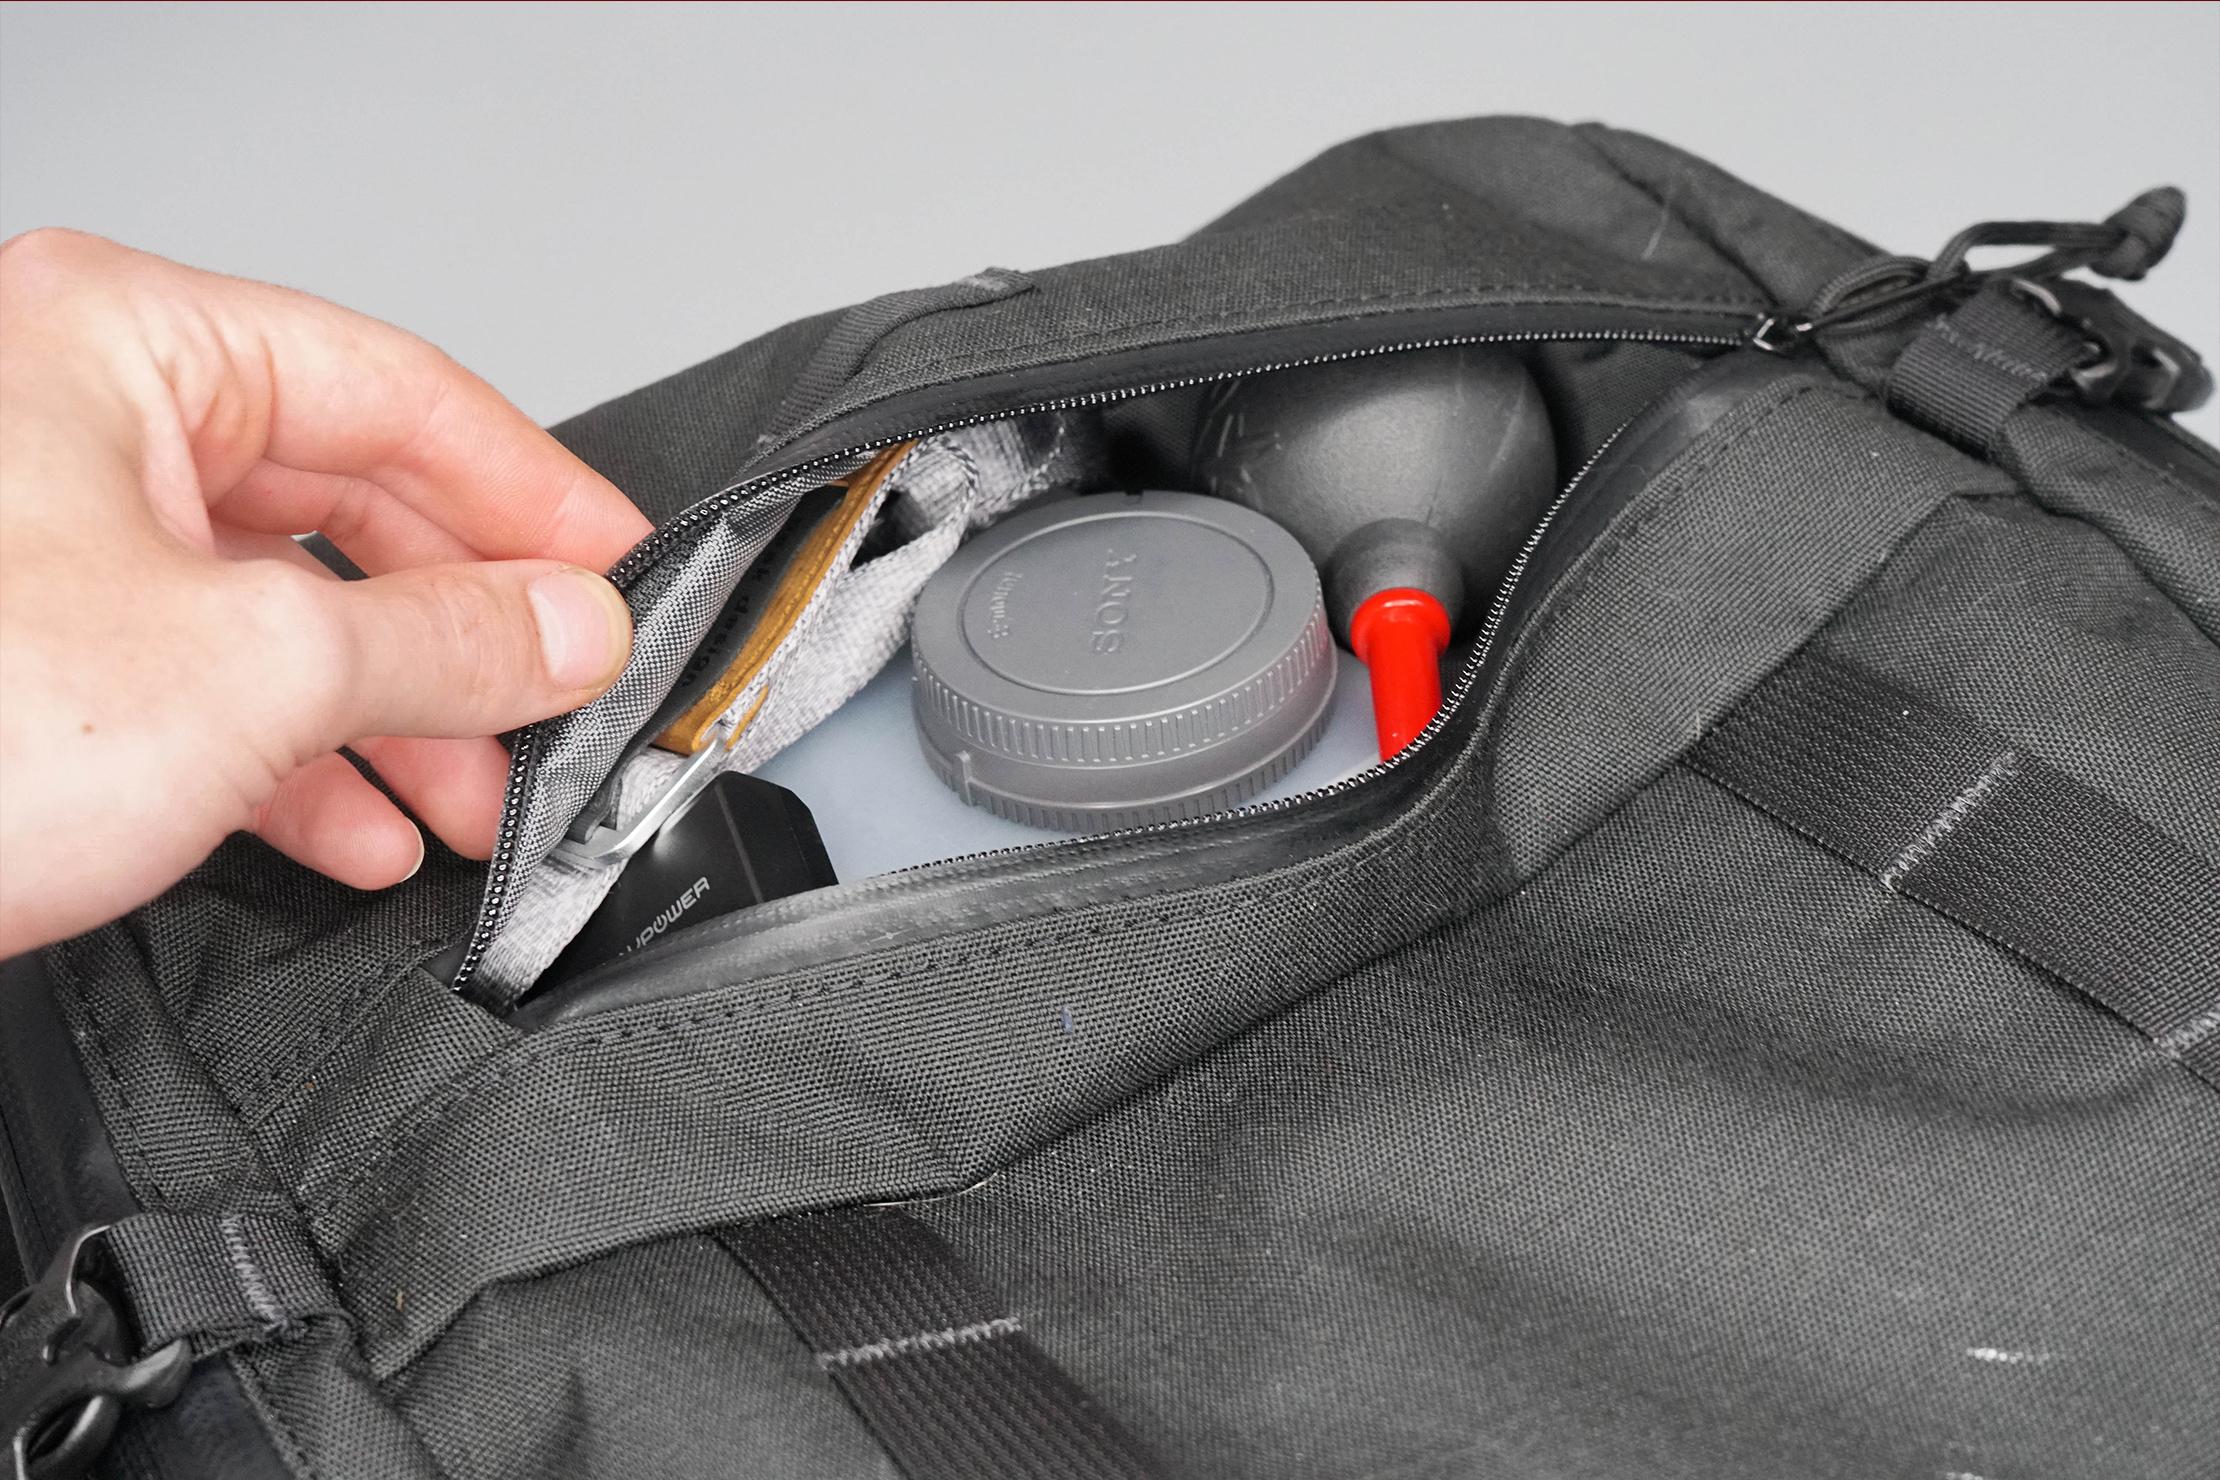 North St. Bags Weekender Backpack Bottom Pocket